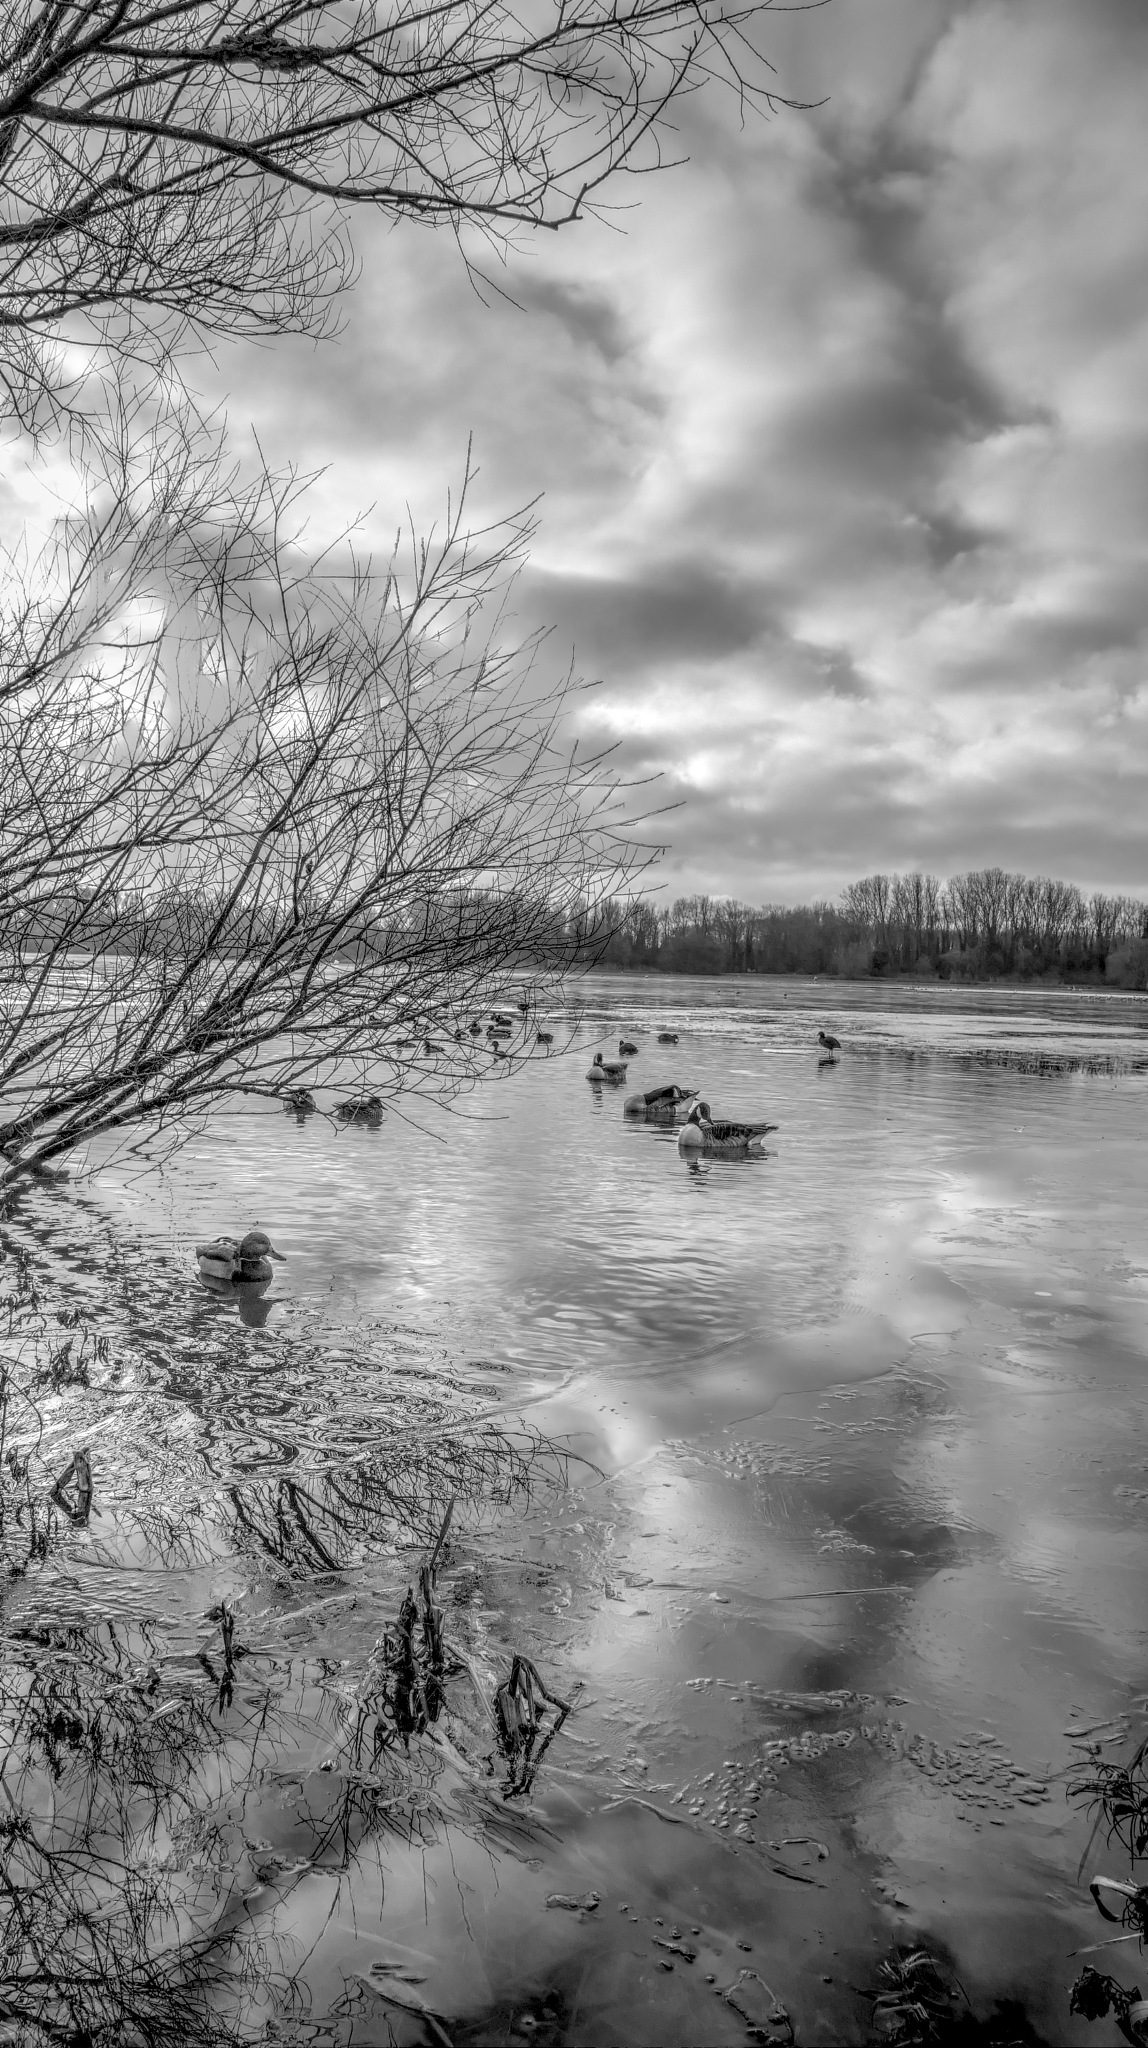 Lake & Clouds (B&W) by Steven Iodice